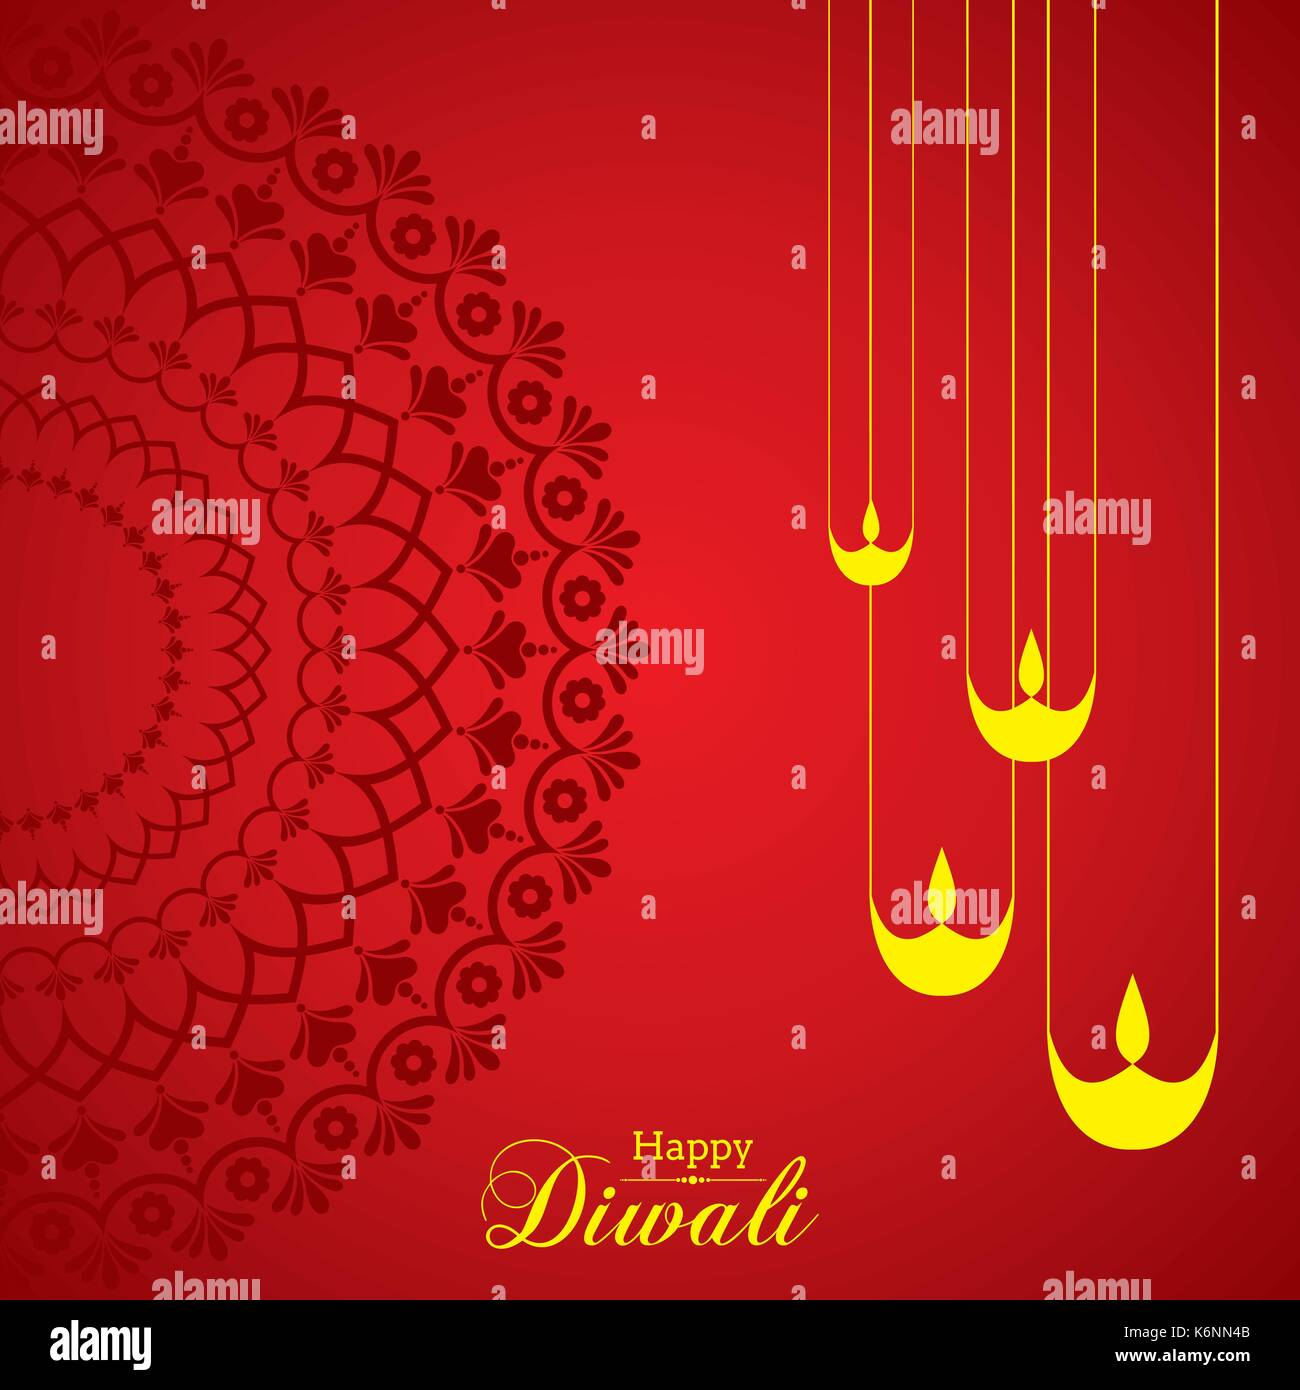 Abbildung: Diwali utsav Begrüßung oder Poster Karte Vektor Abbildung ...